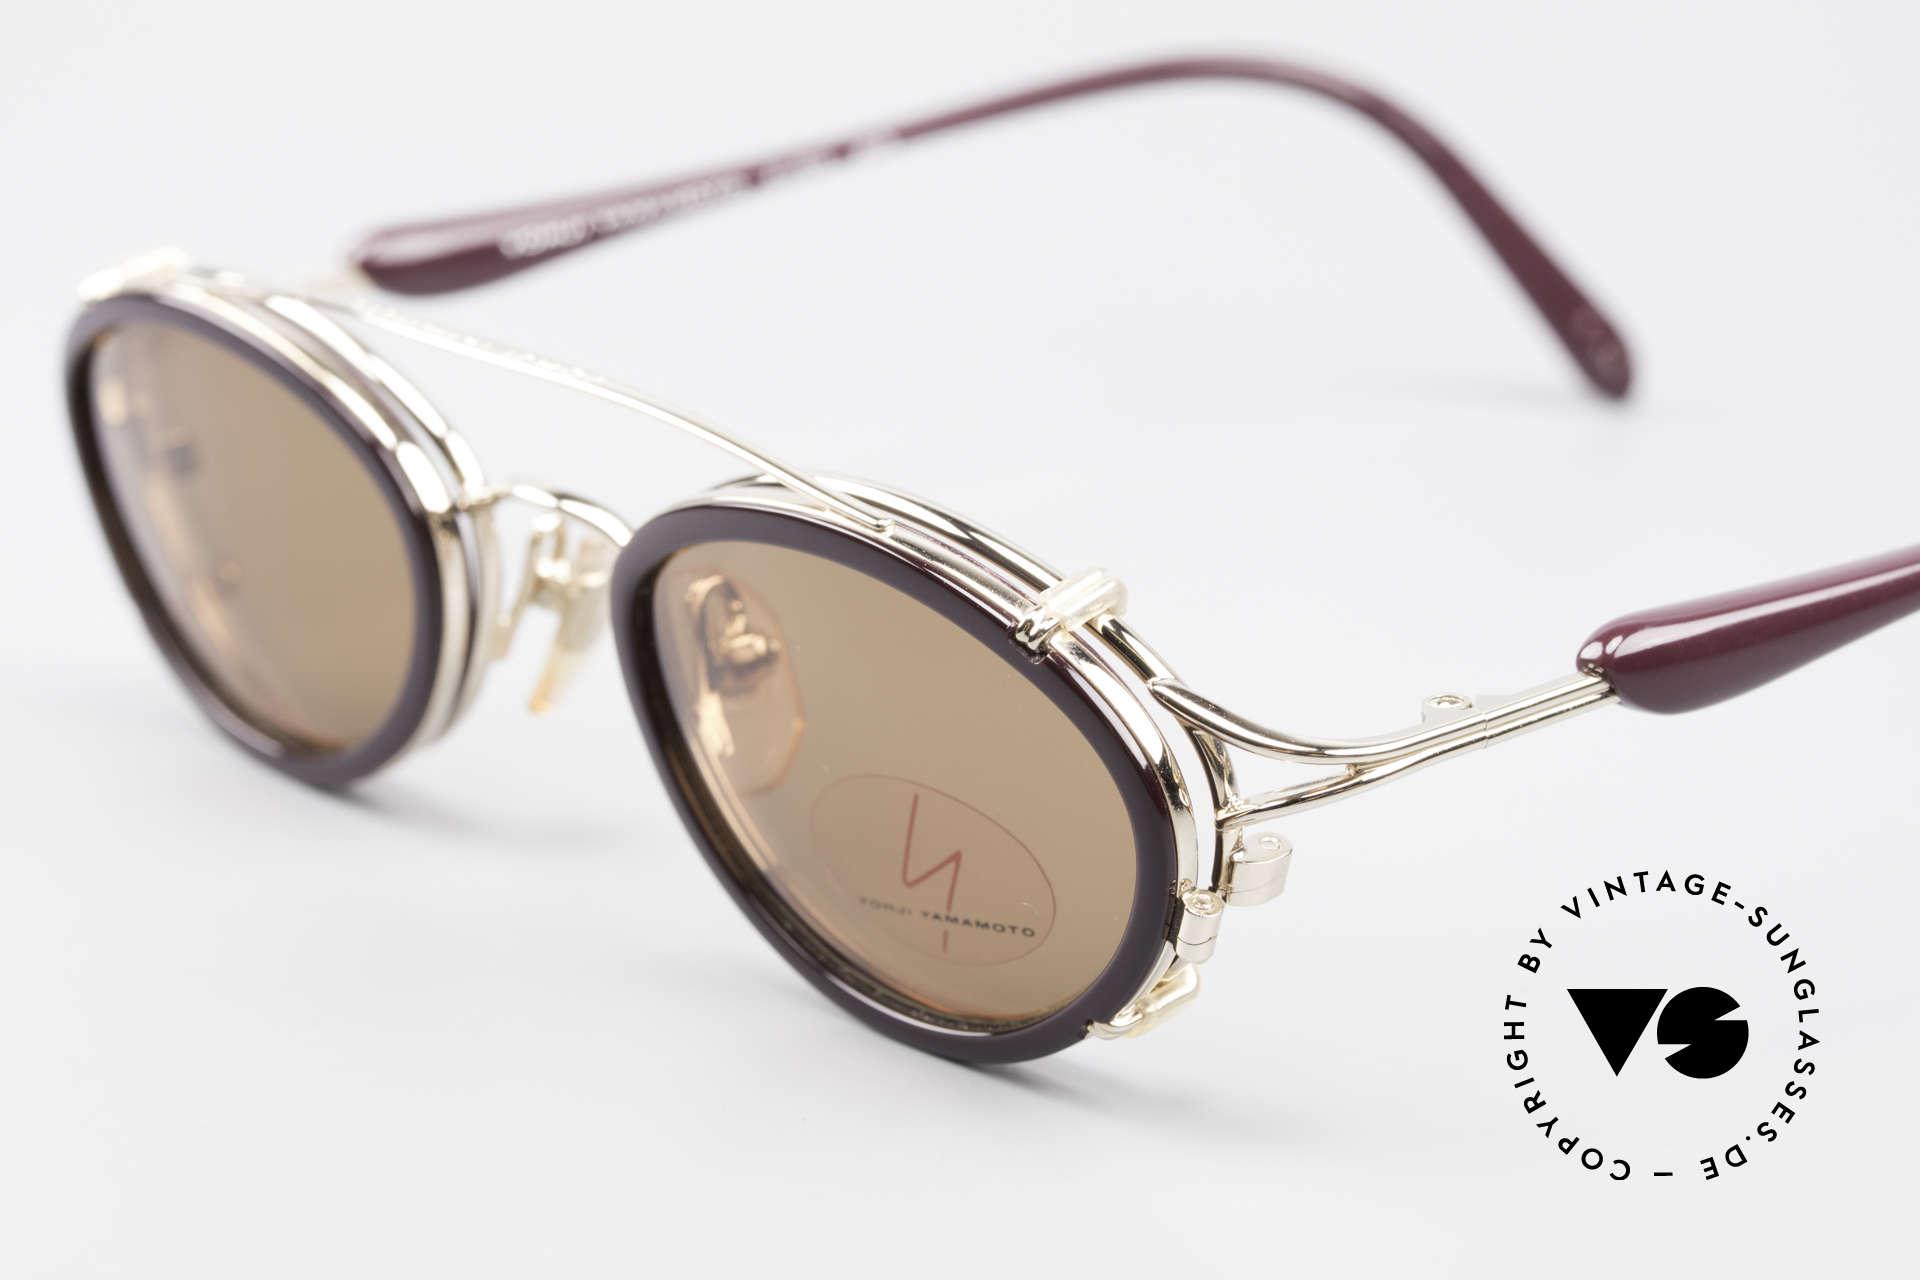 Yohji Yamamoto 51-7210 Clip-On 90's No Retro Frame, unused (like all our Haute Couture designer glasses), Made for Men and Women